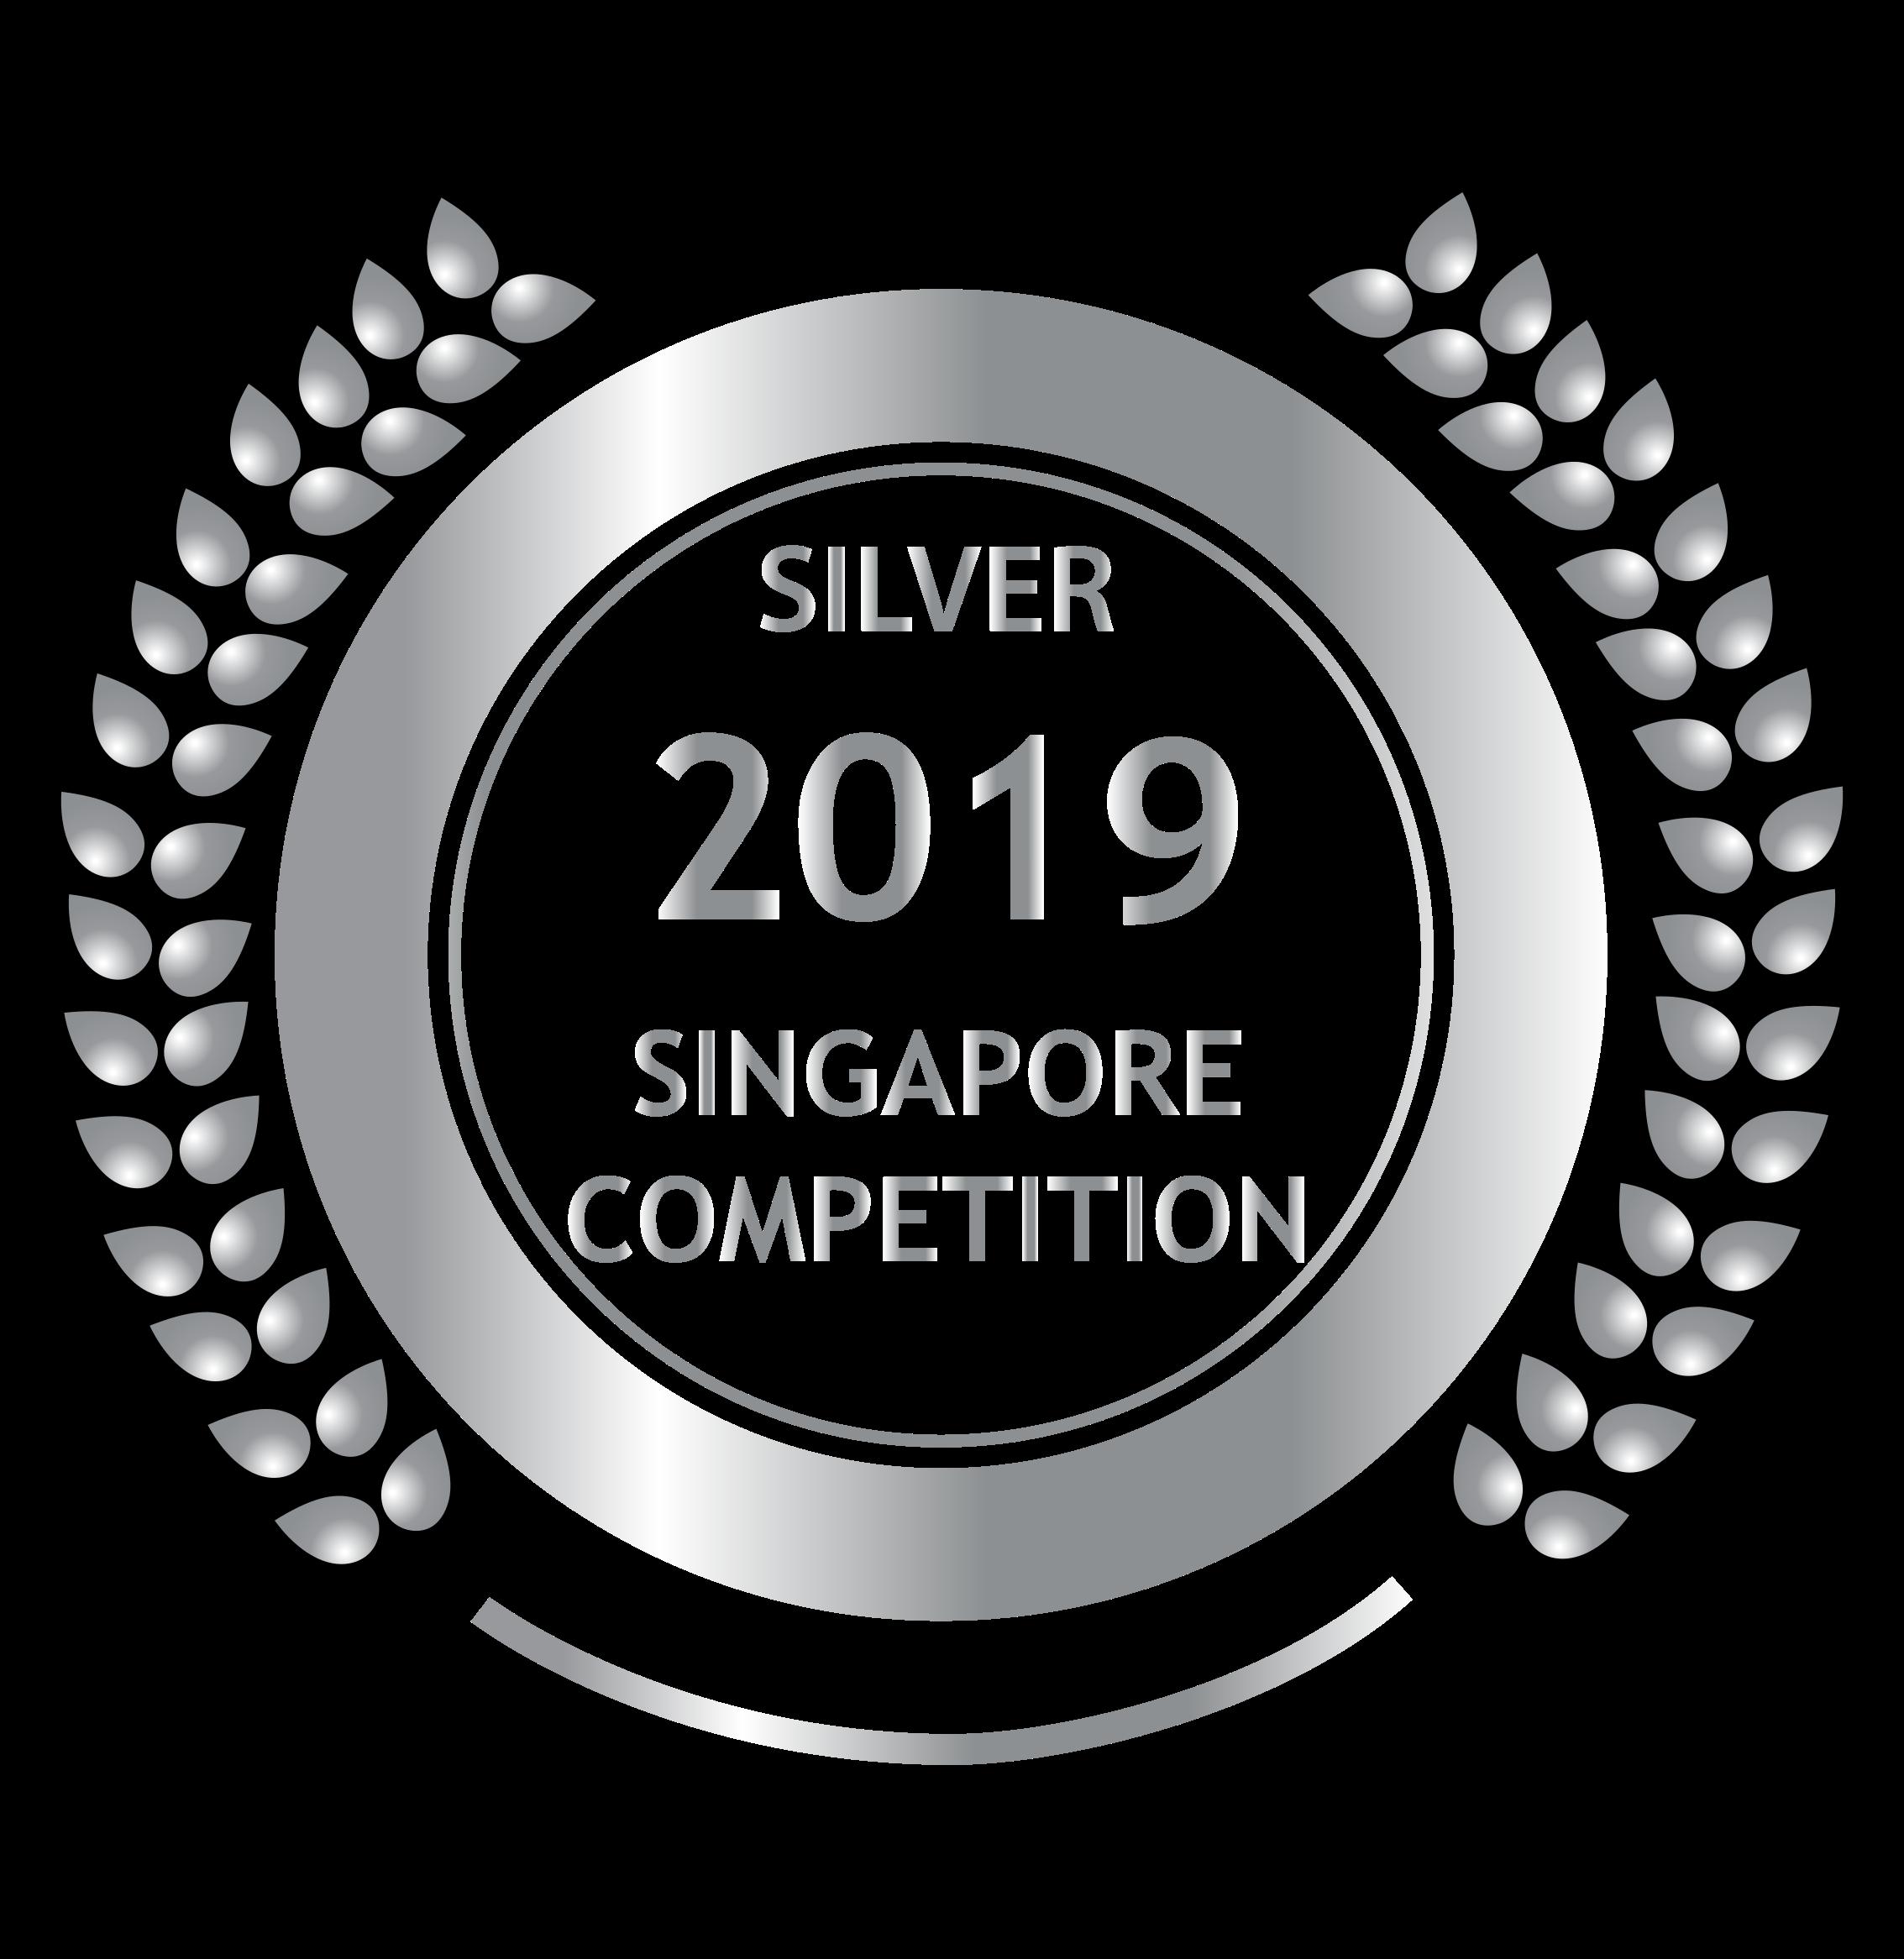 Silver Medal Singapore Awards 2019